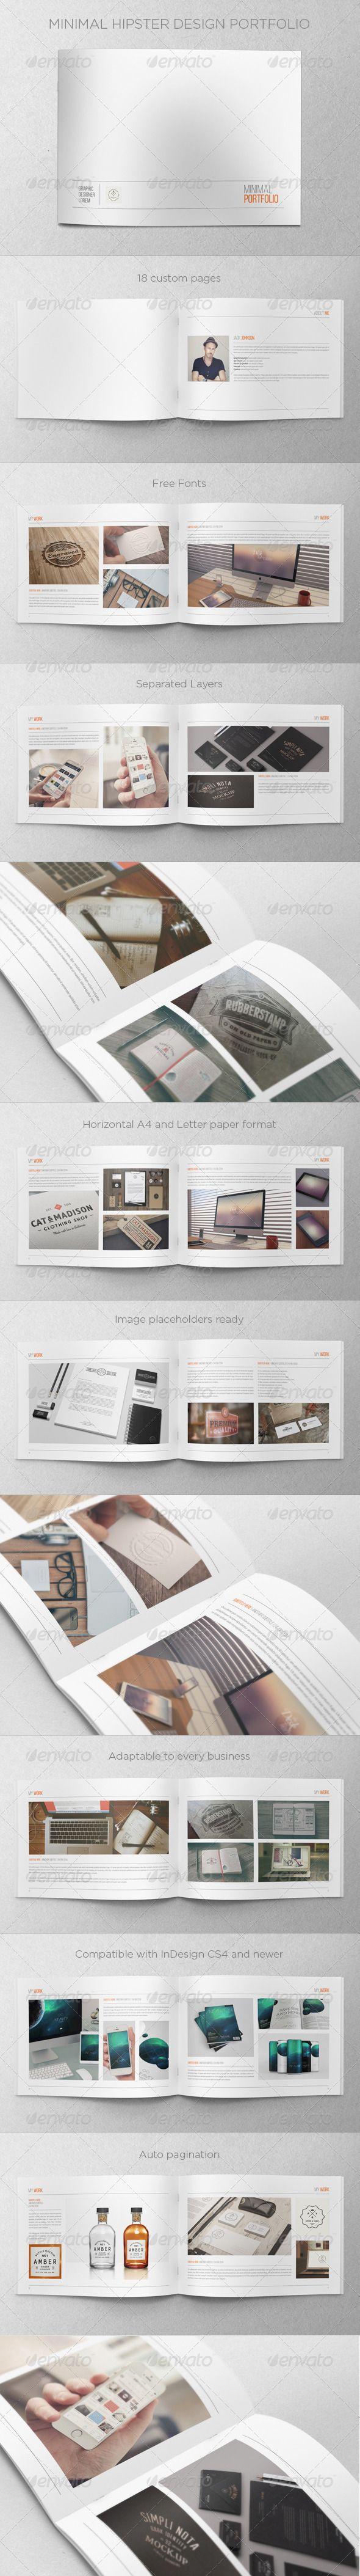 Minimal Hipster Design Portfolio